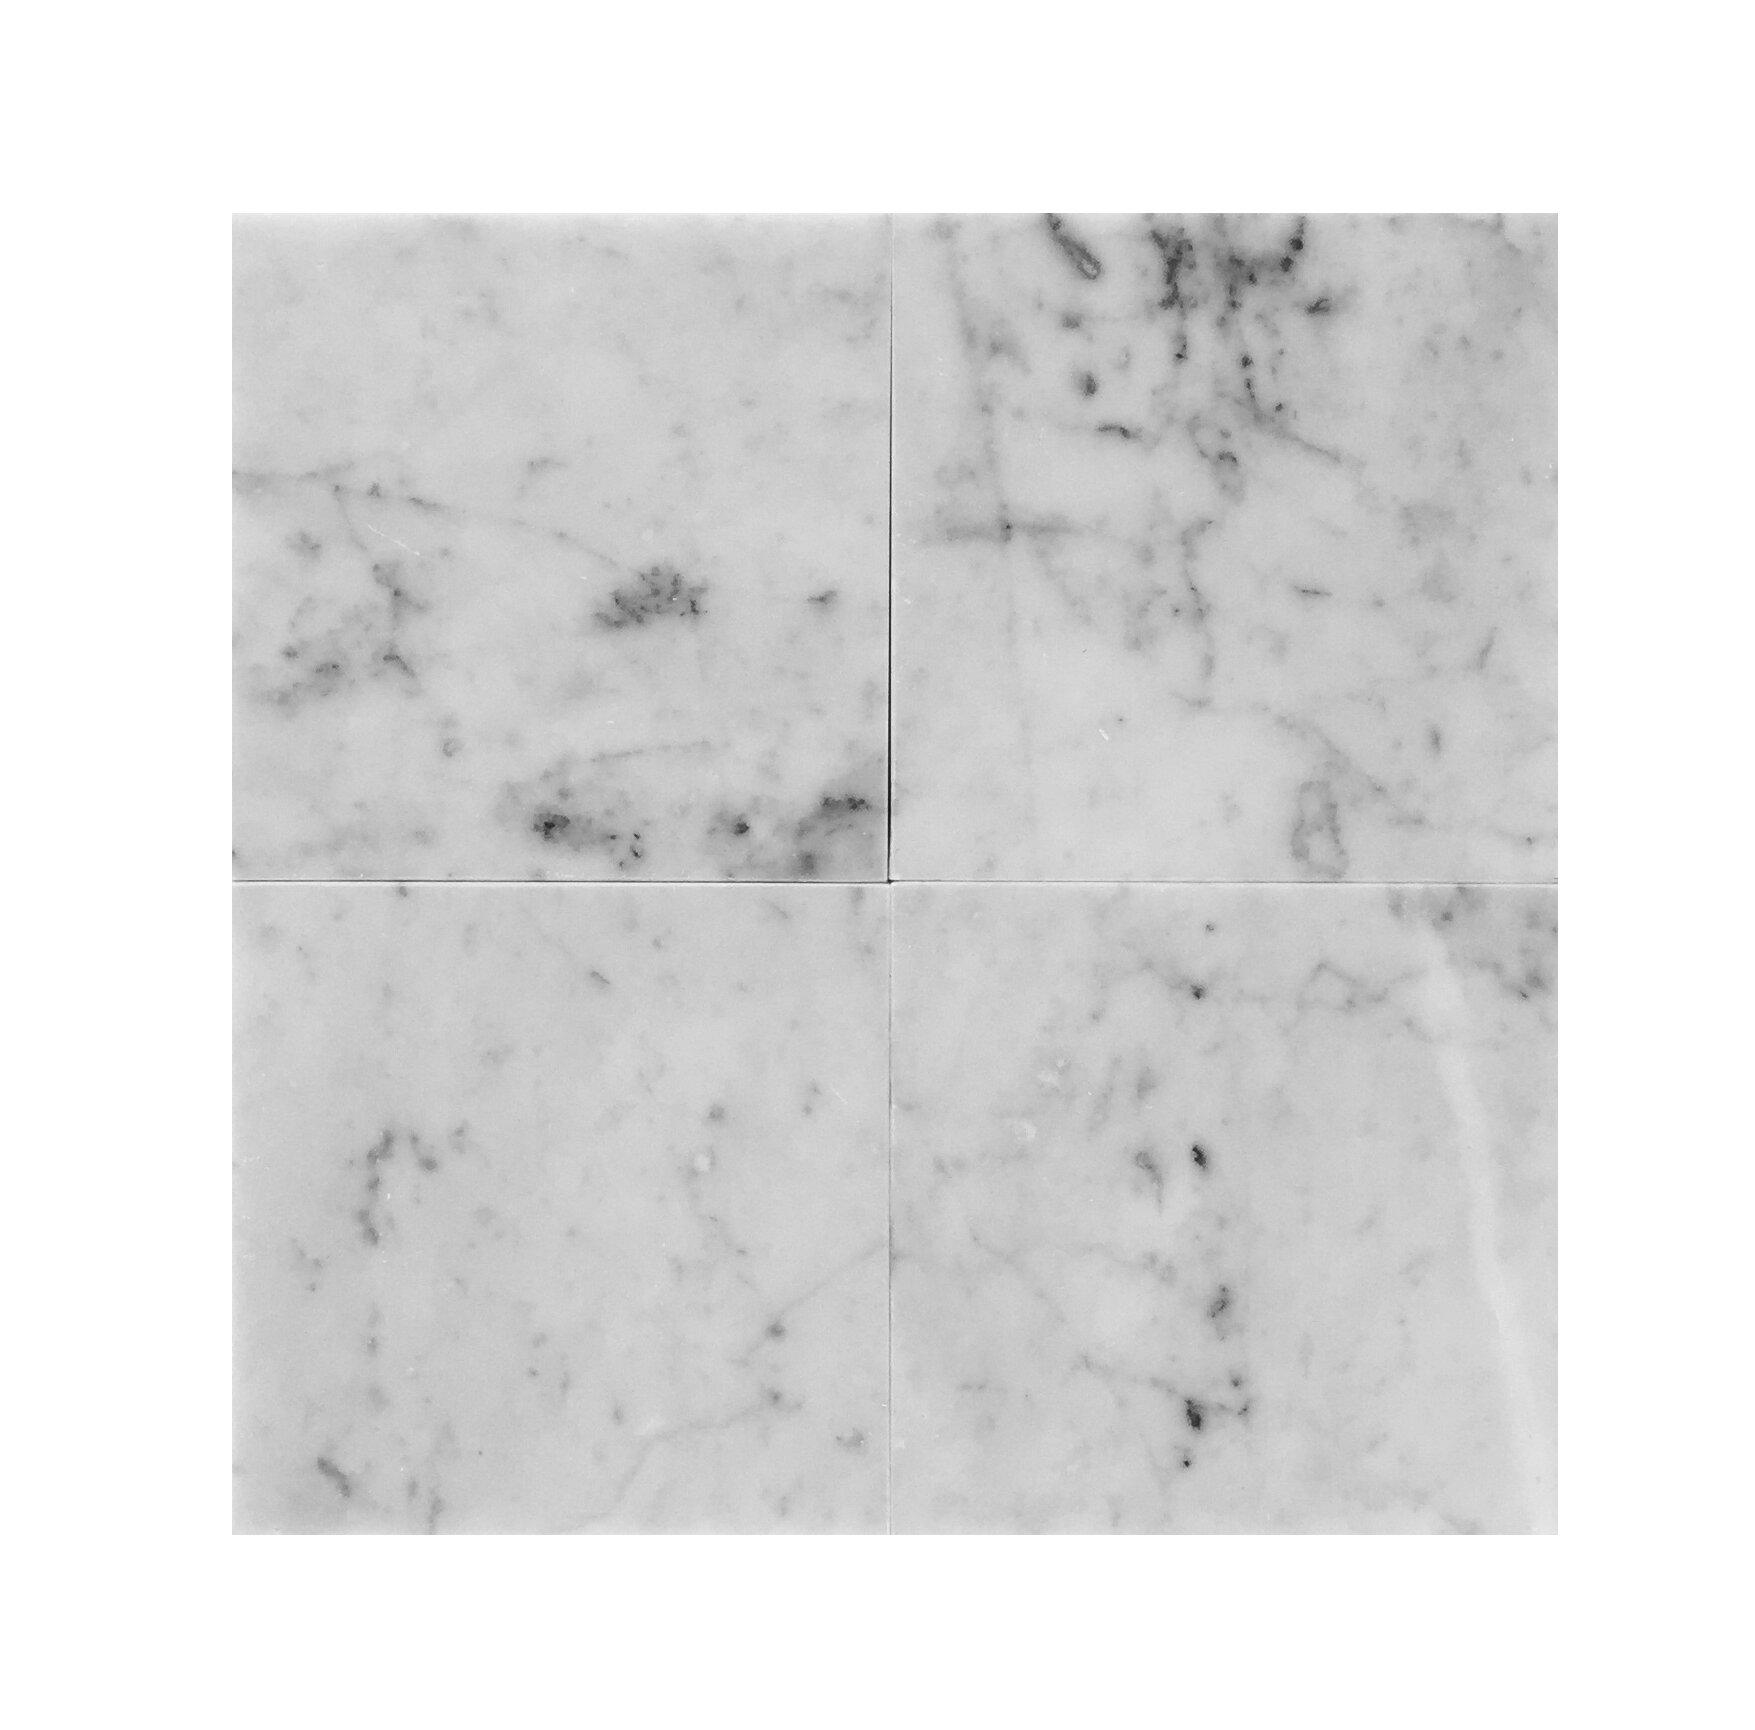 6 X 6 Marble Floor Tiles Wall Tiles You Ll Love In 2021 Wayfair